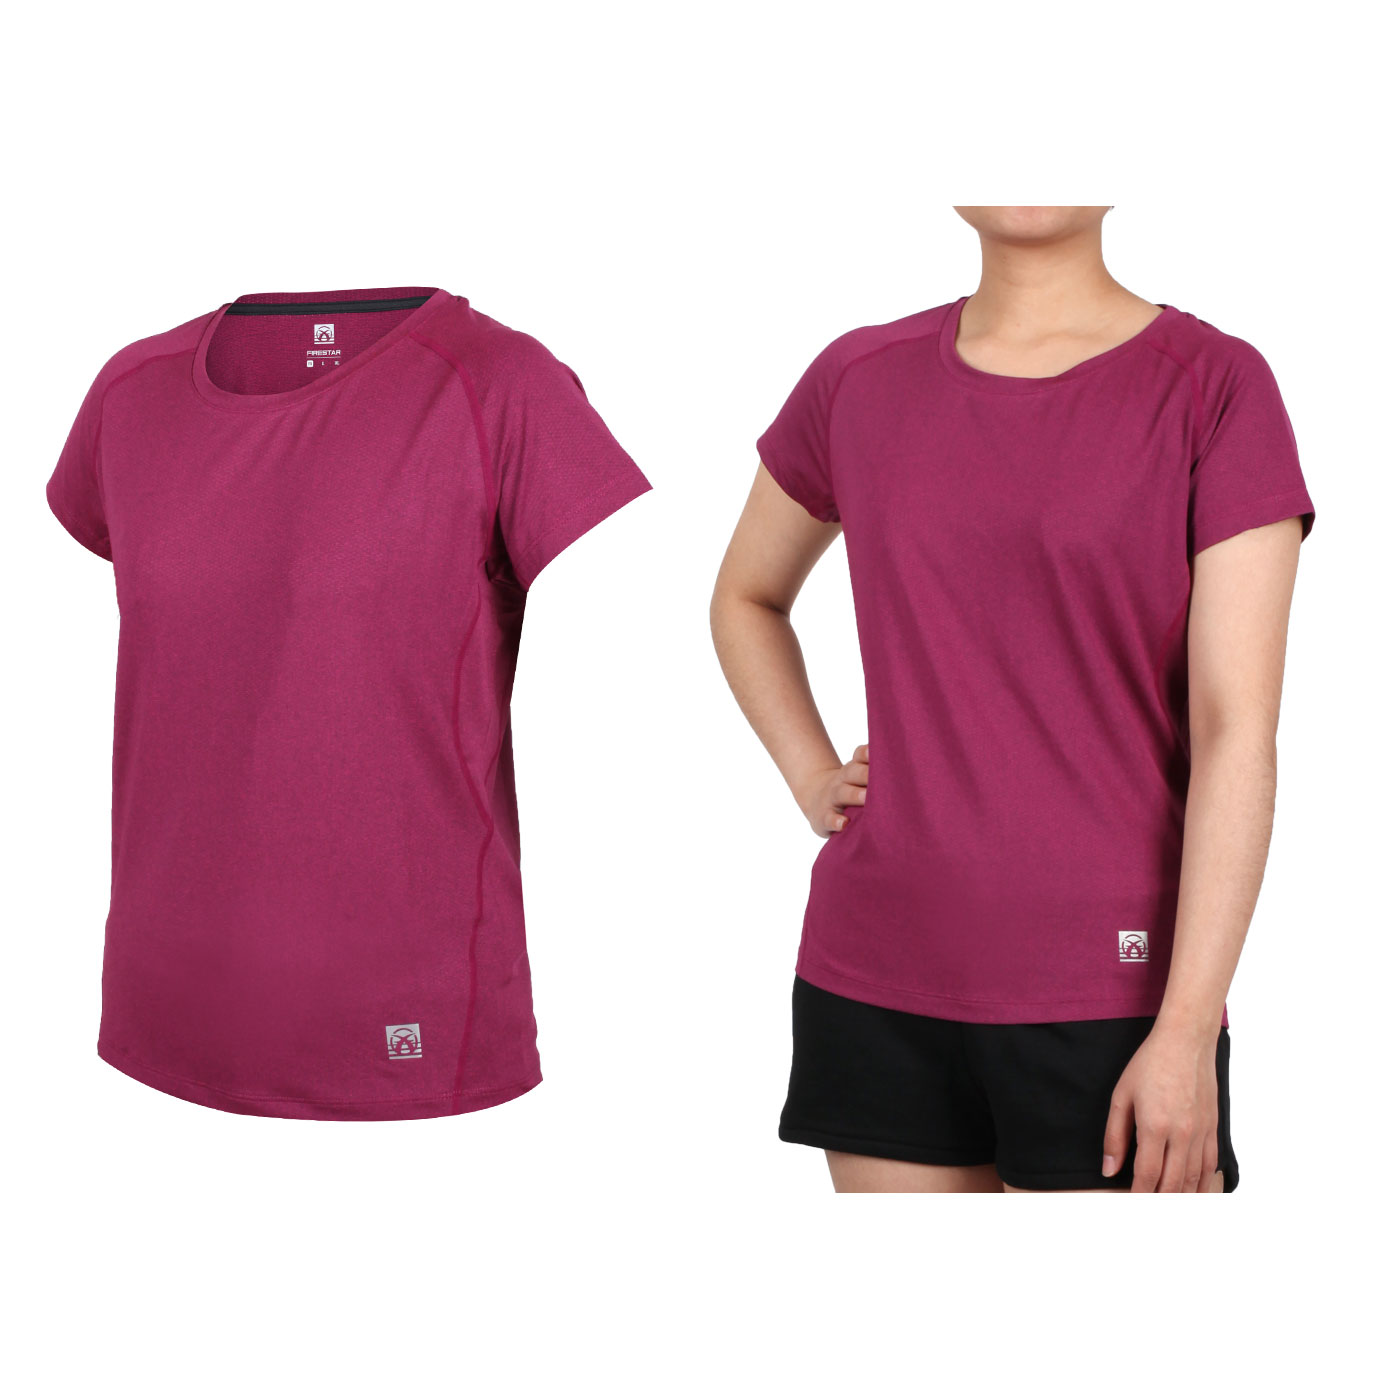 FIRESTAR 女款彈性剪接圓領短袖T恤 DL060-19 - 深桃紅